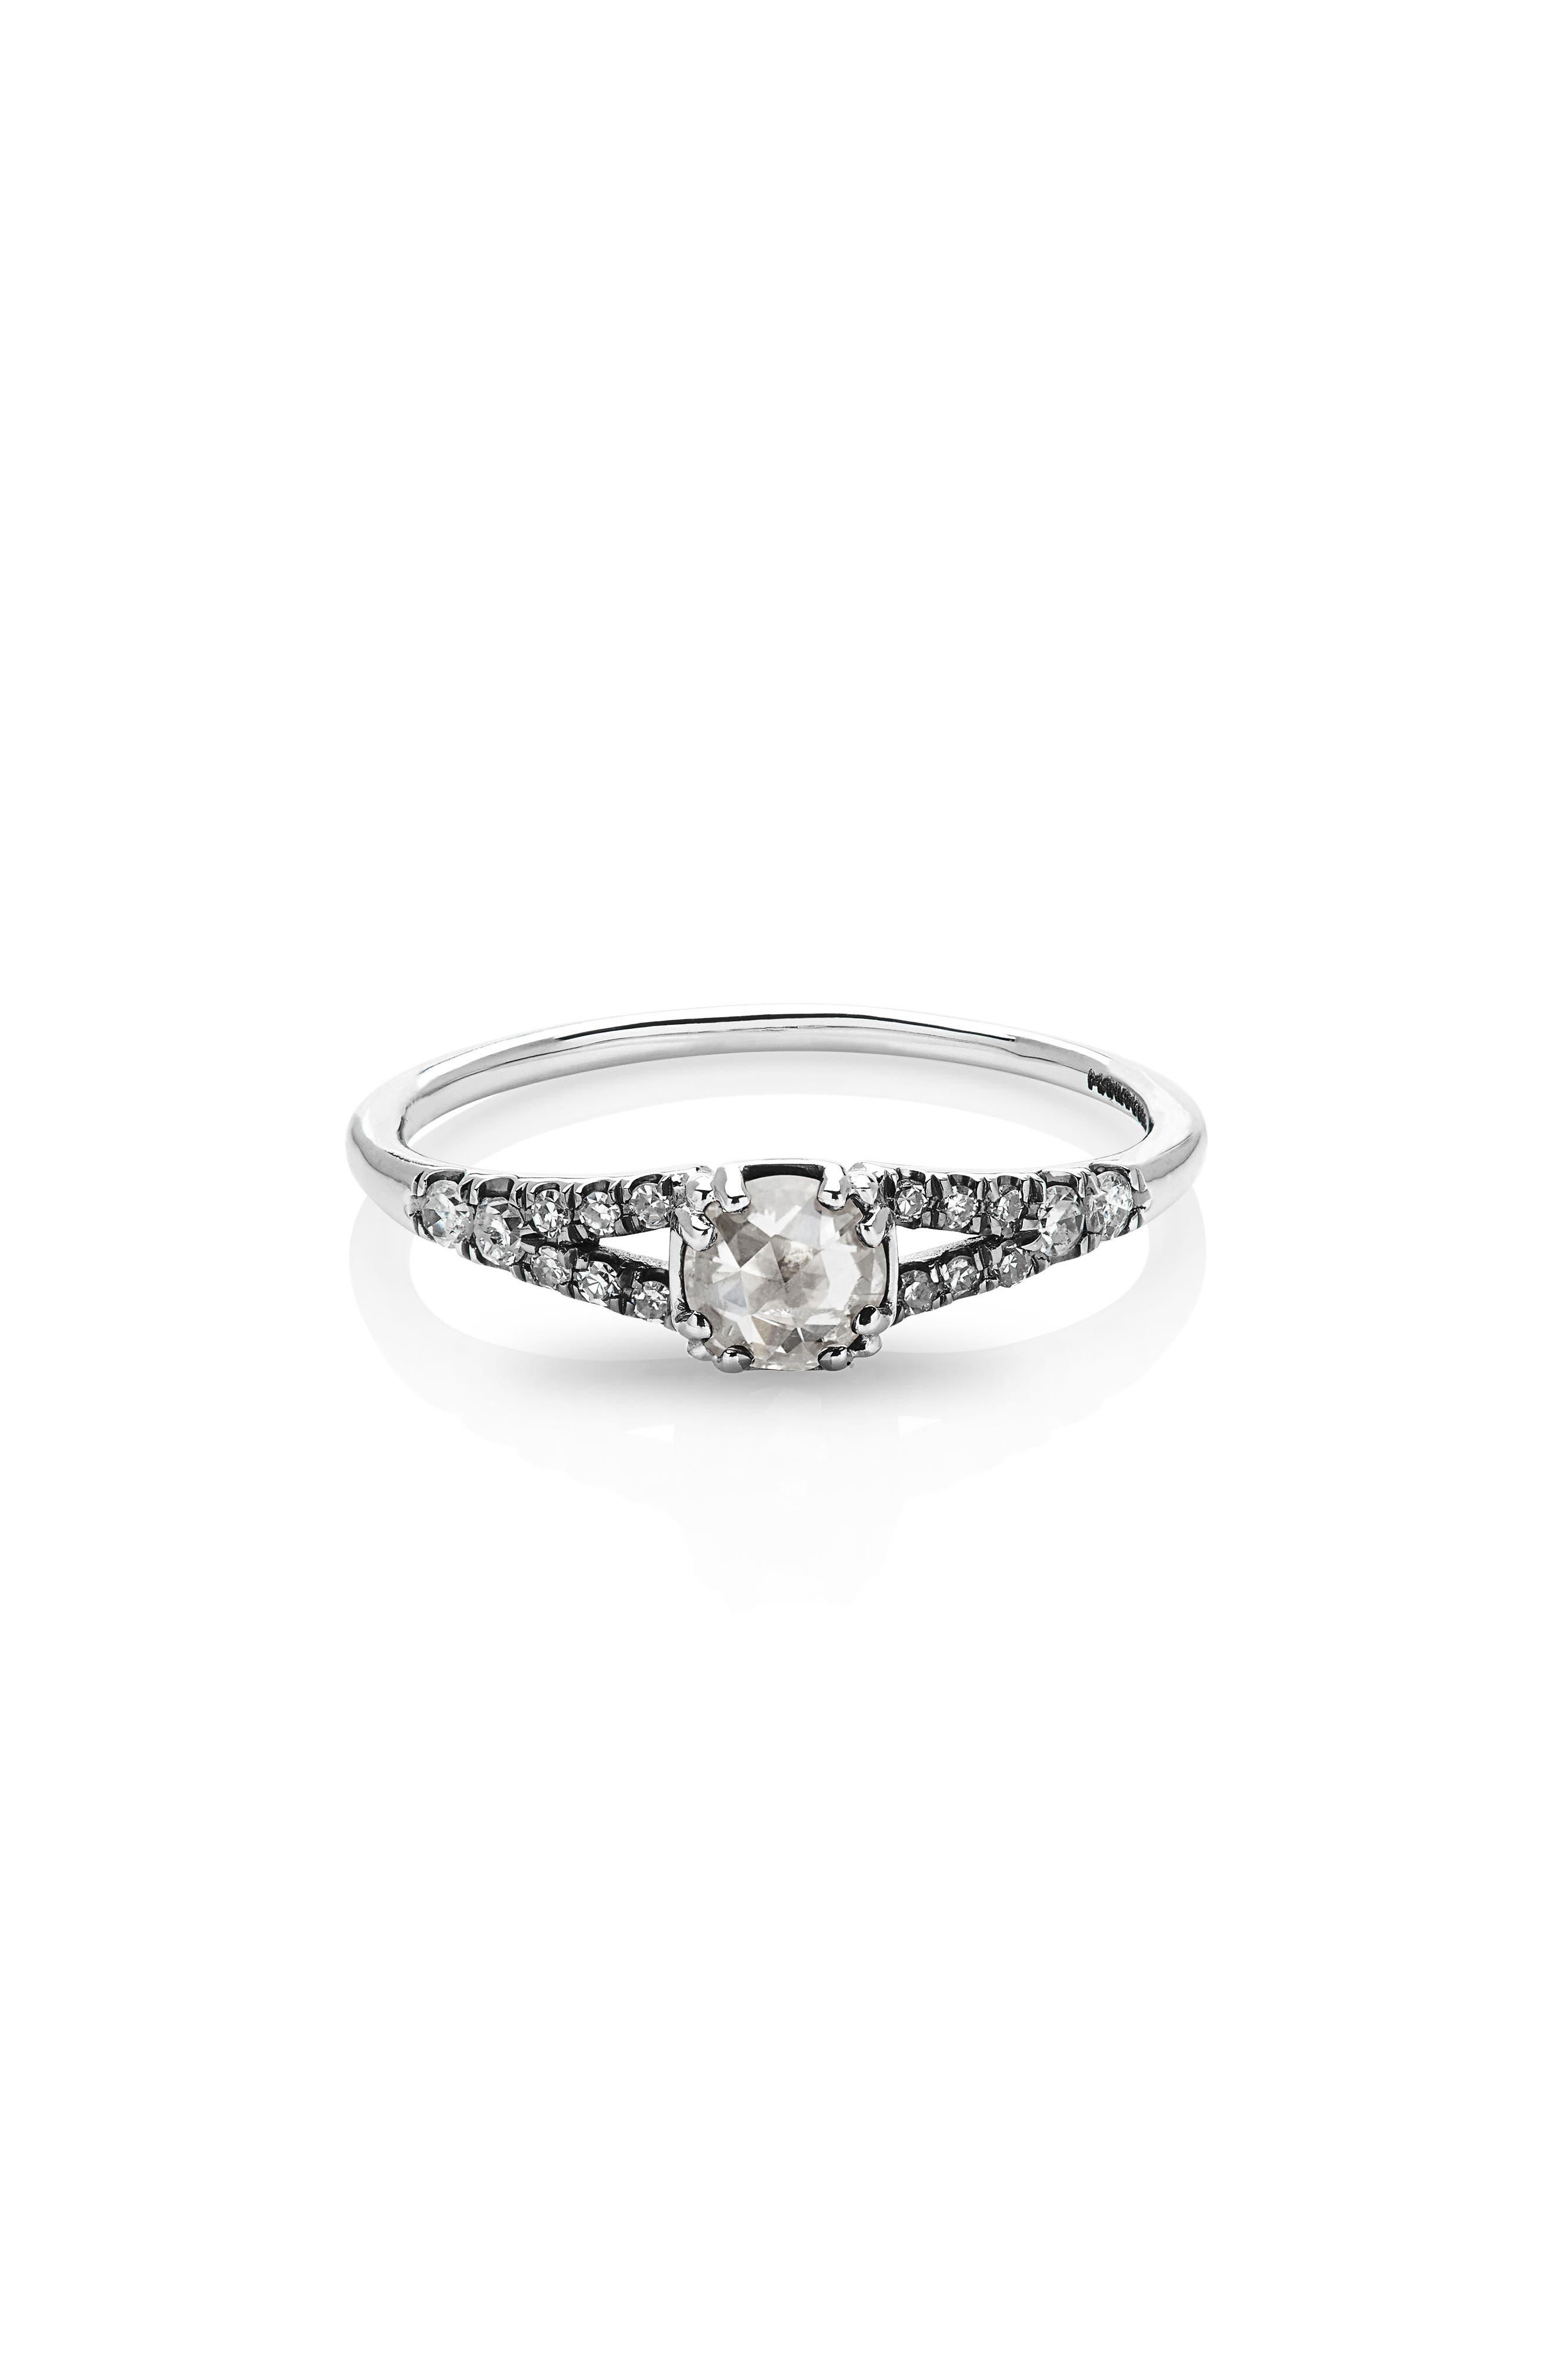 Main Image - Maniamania Devotion Solitaire Diamond Ring